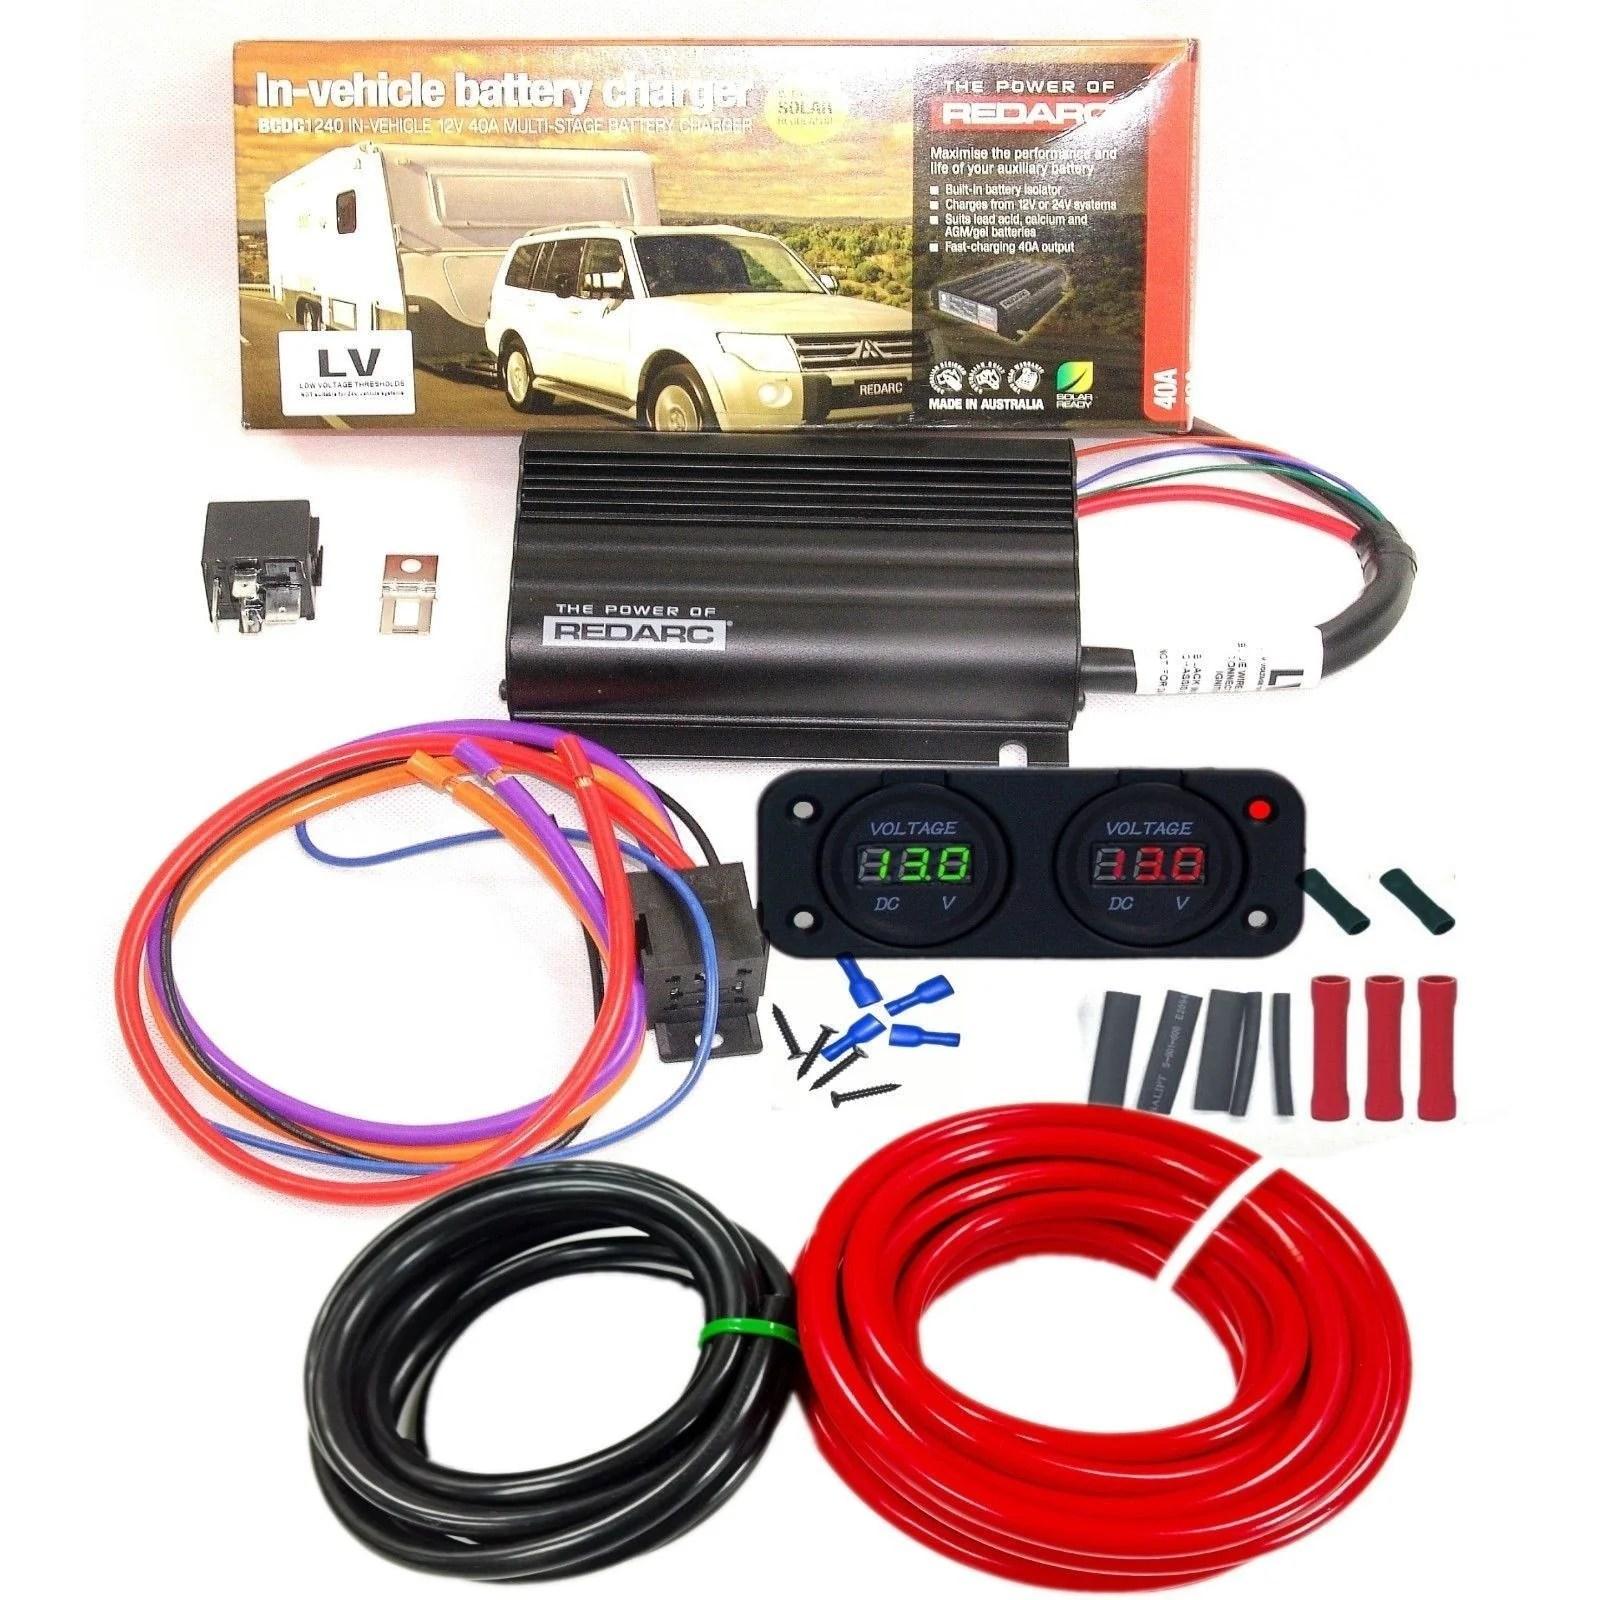 medium resolution of redarc bcdc 1240 24v to 12v dual battery system dc dc charger mppt solar kit